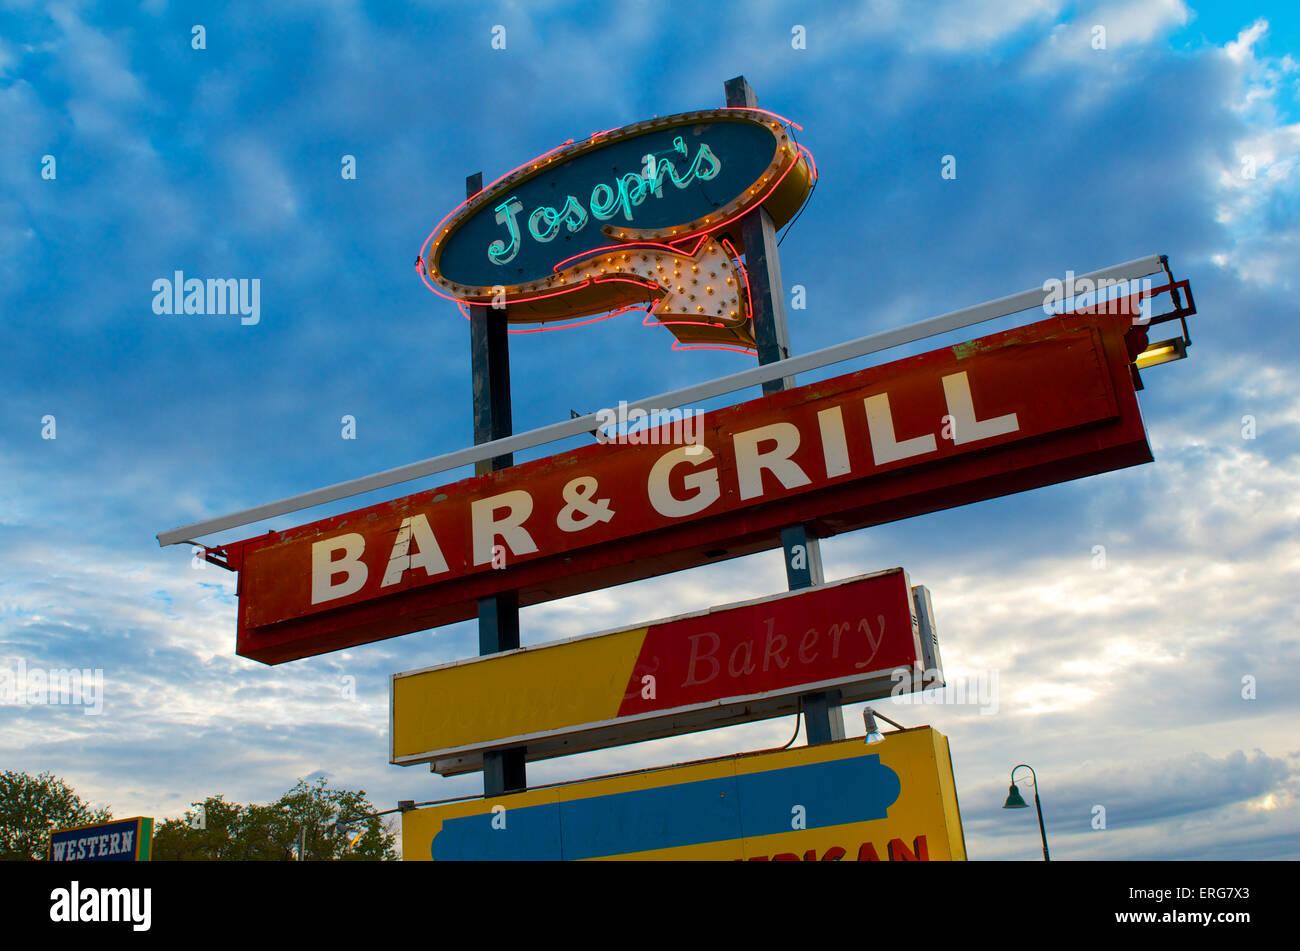 joseph's bar and grill historic neon sign in santa rosa, nm route 66